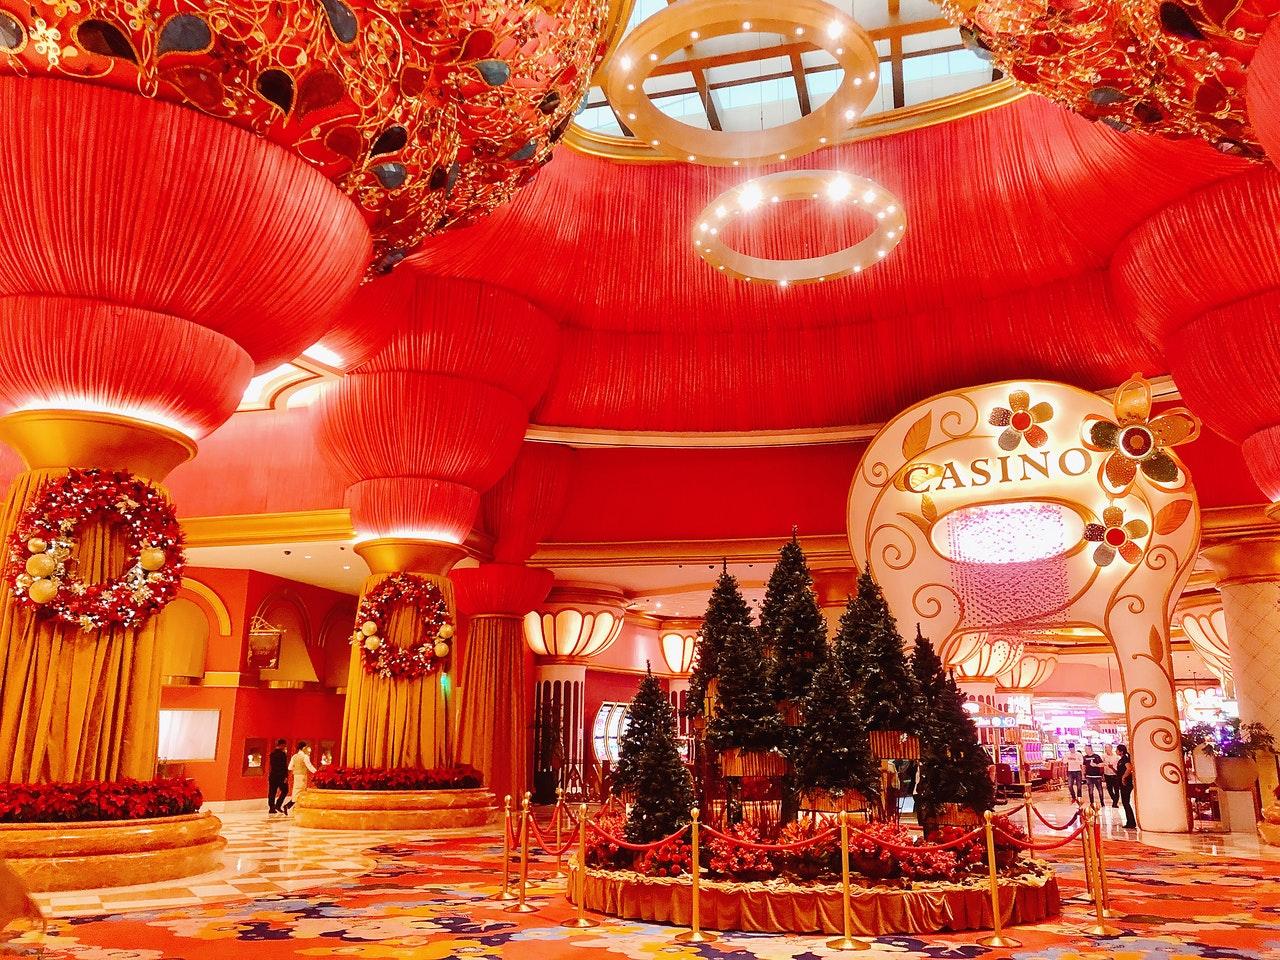 Casino, Hotel, Foyer